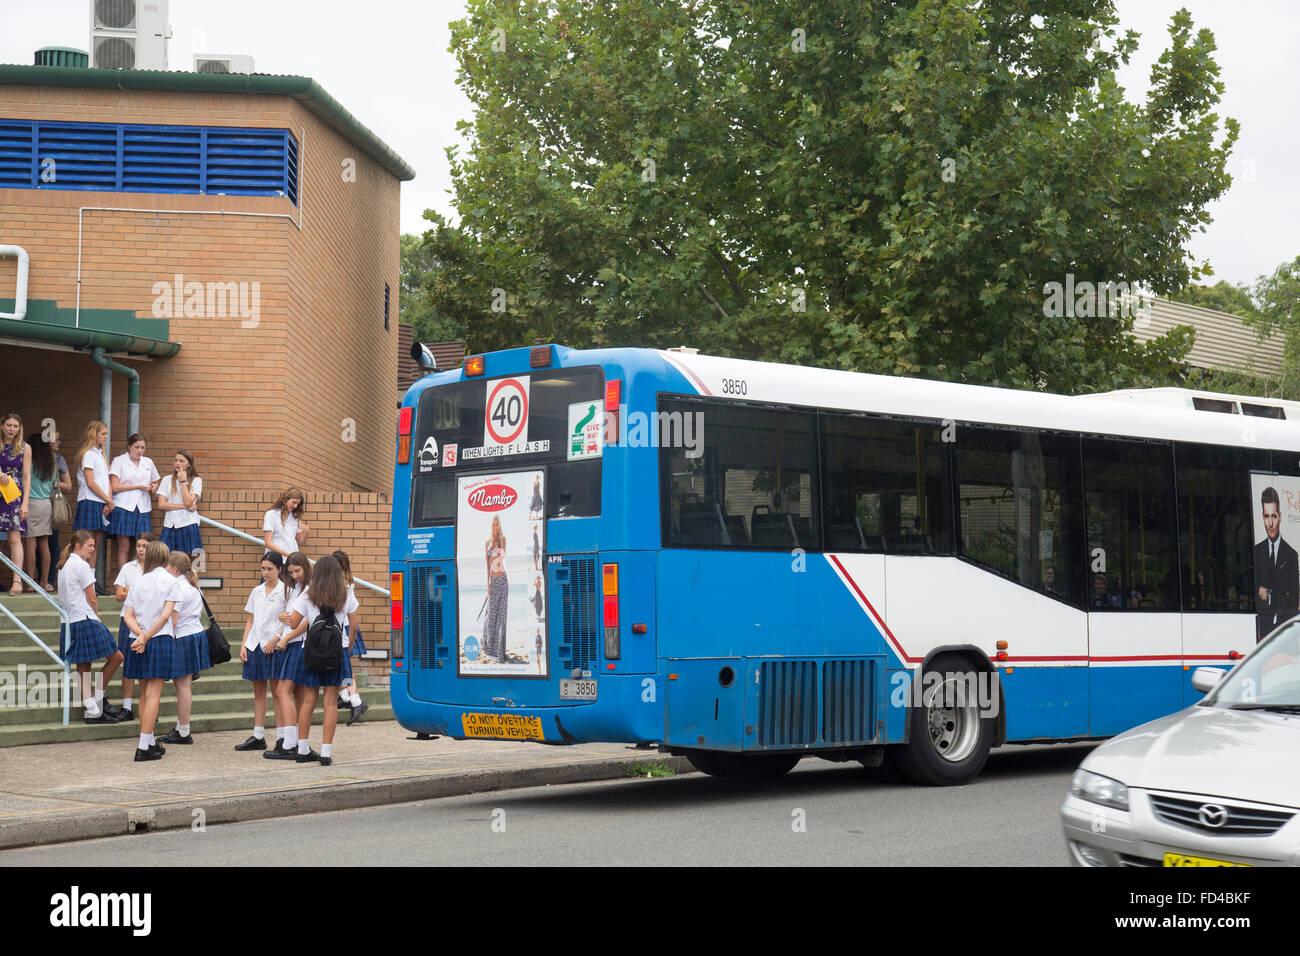 Mackellar secondary girls school in manly vale,Sydney,New south wales,australia - Stock Image